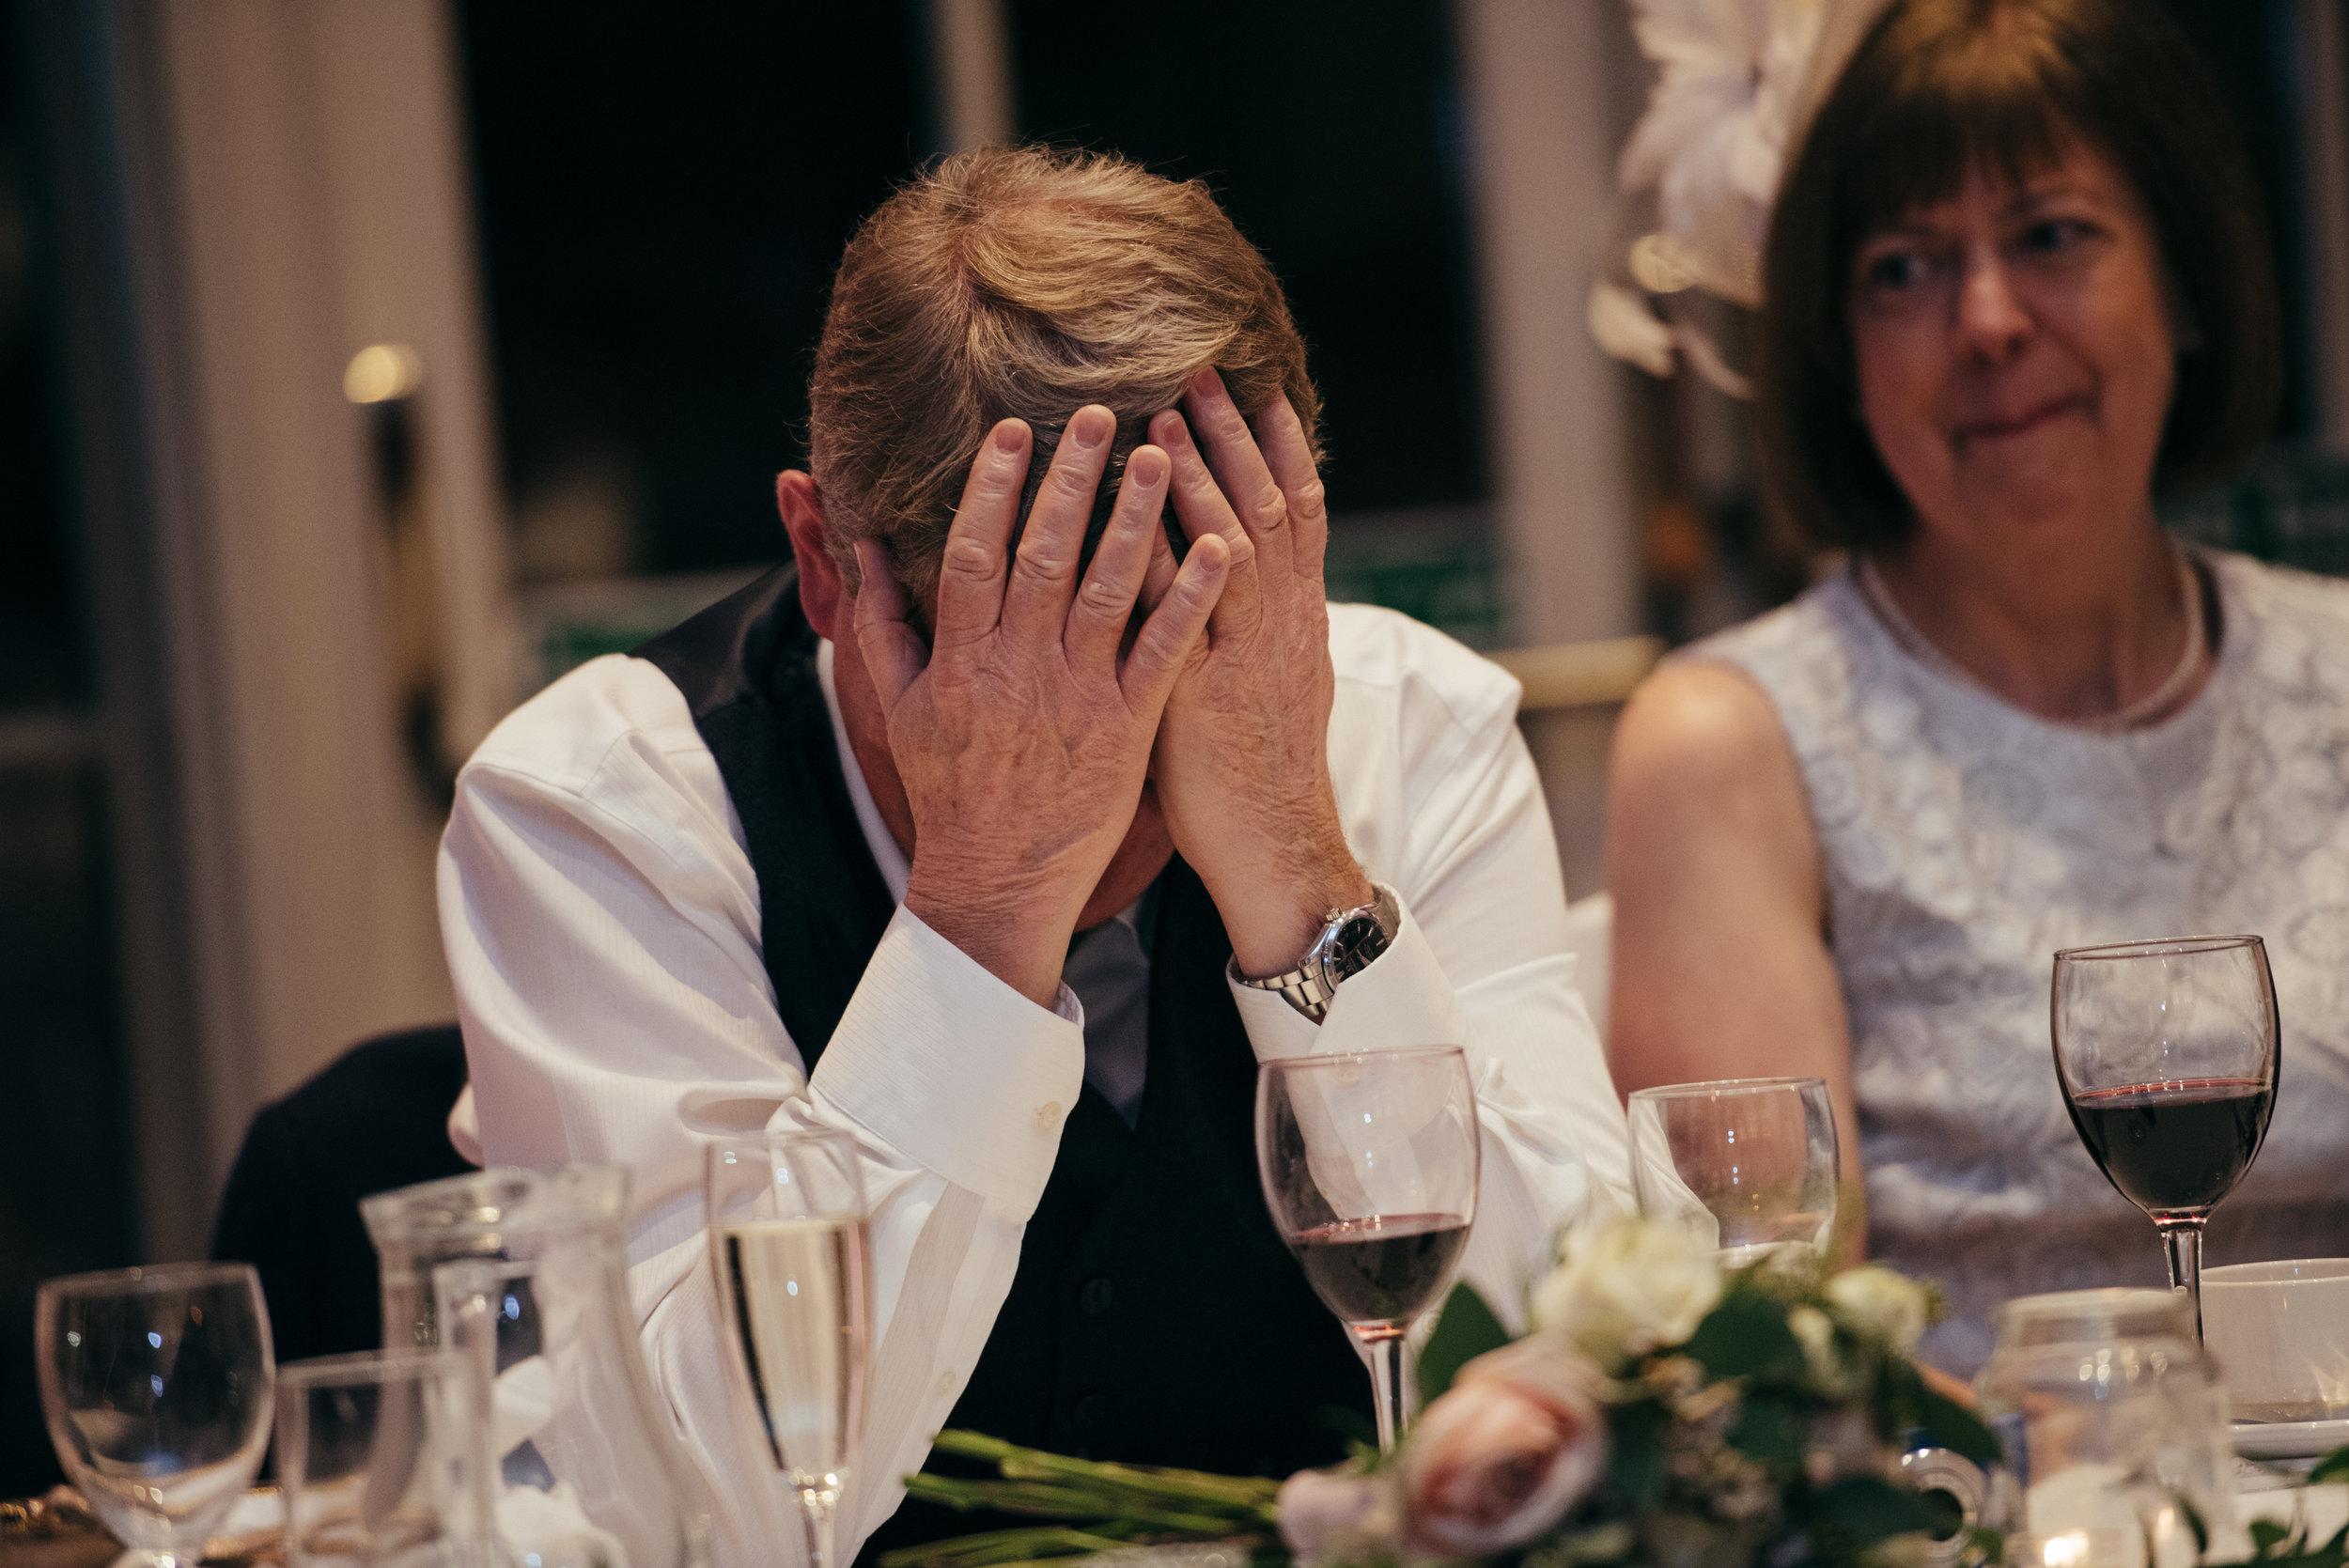 S&D(wedding)647.jpg